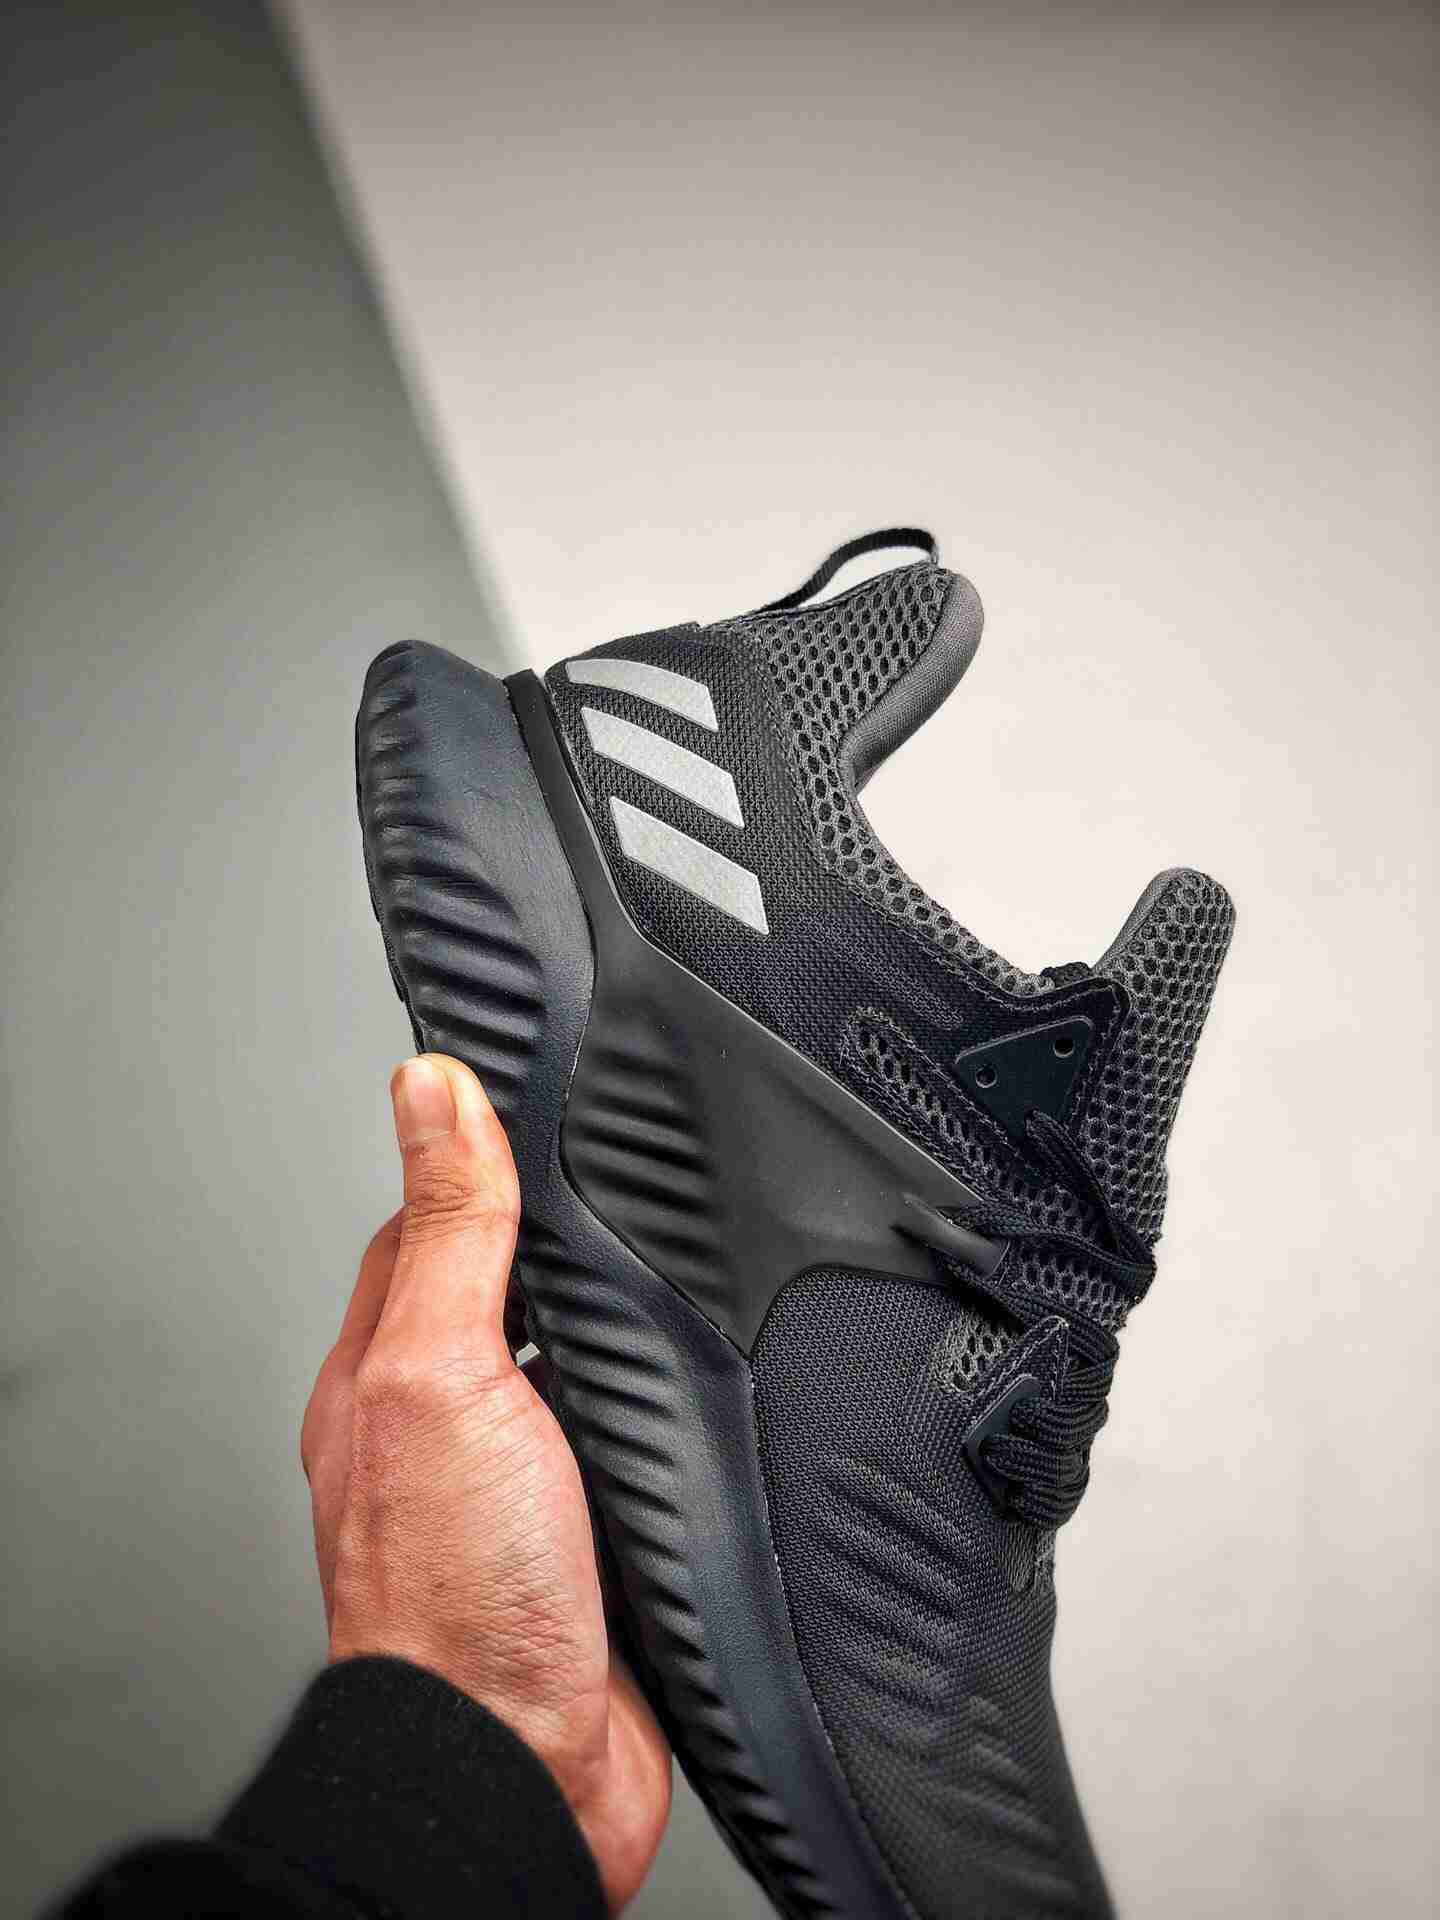 Adidas AlphaBounce HPC AMS  阿尔法v3.5 官方同步配色首发